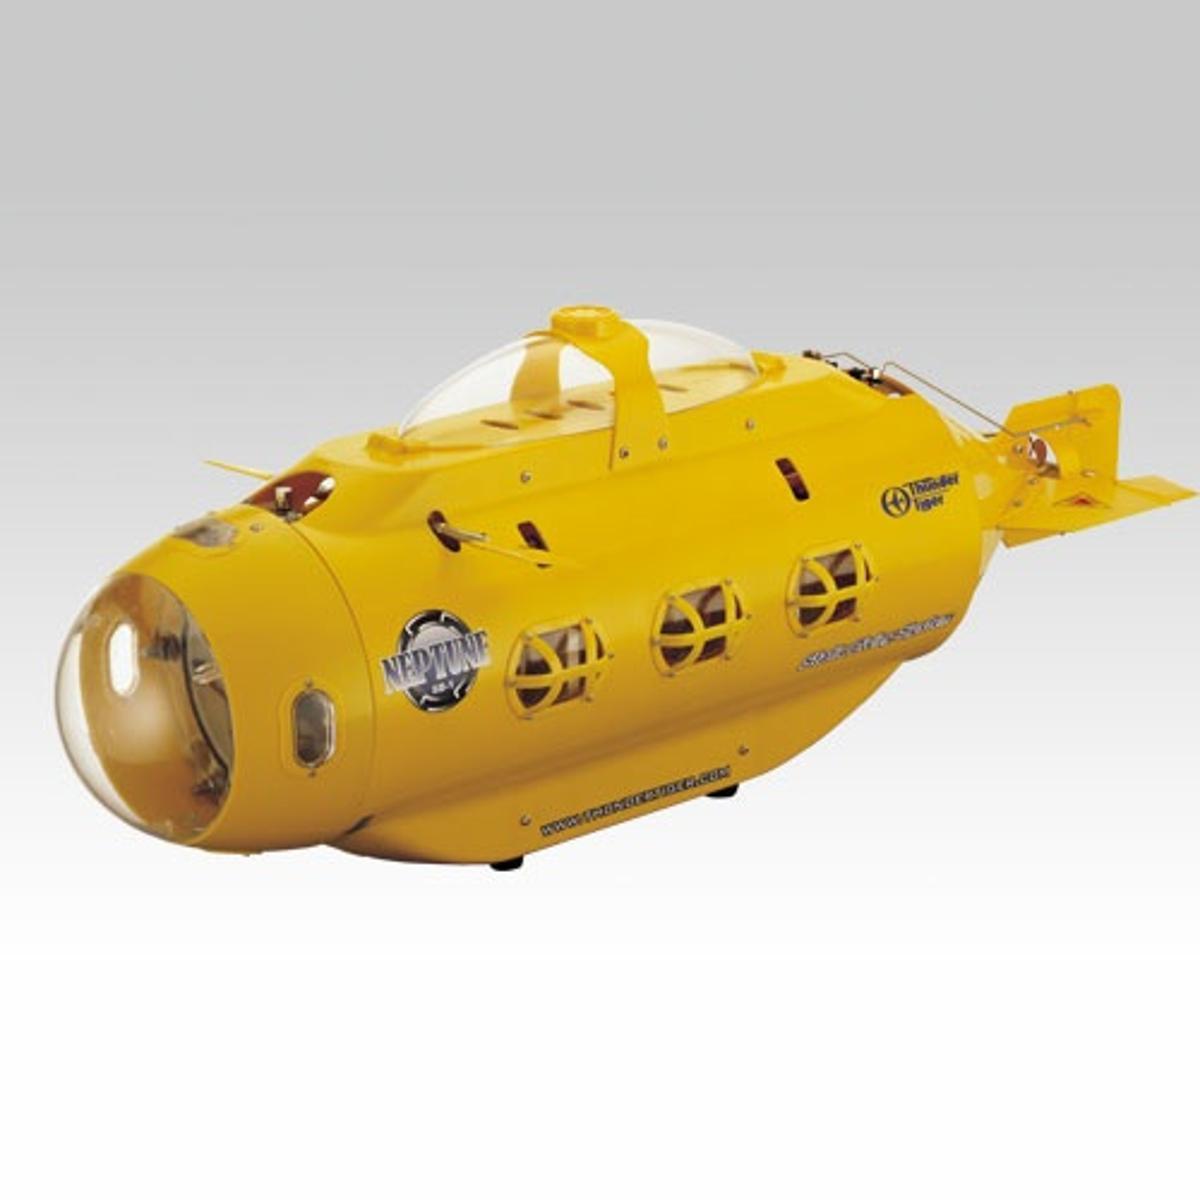 The Neptune SB-1 radio-controlled submarine